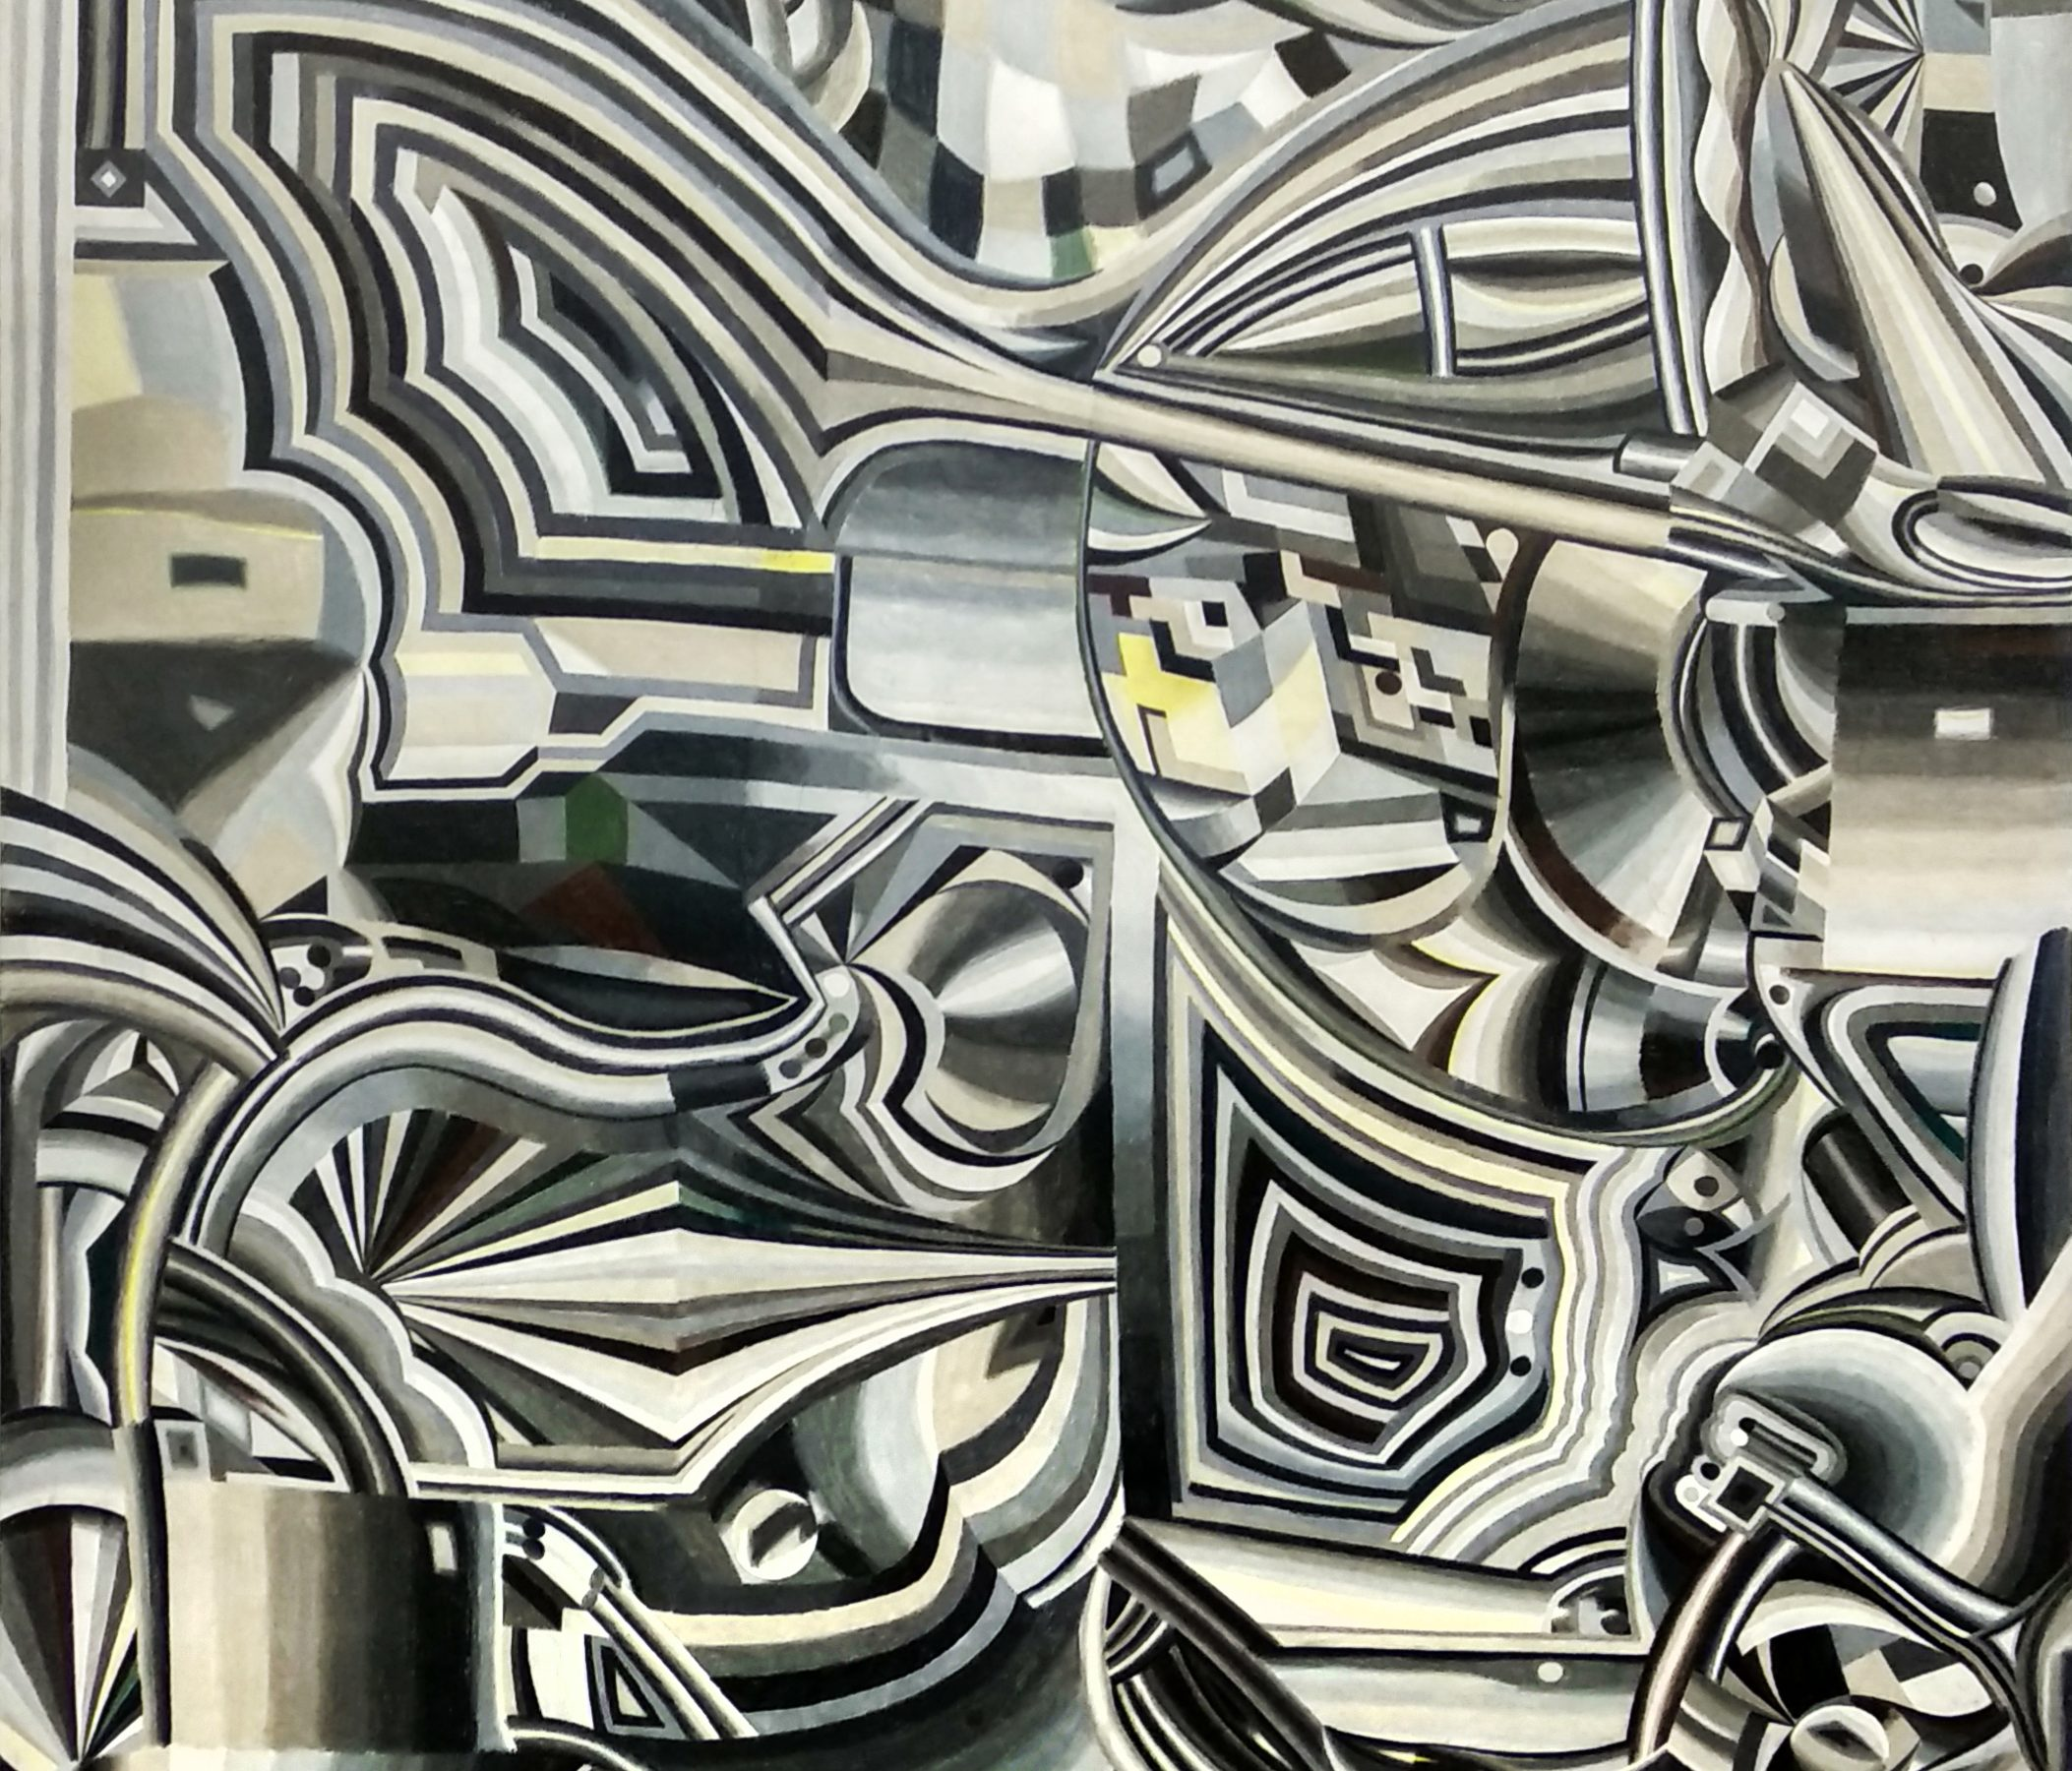 Simon Hemmer (*1978 in Cologne) ´Grau` 2018 colored pencil on paper on canvas 196 x 150 cm © Courtesy Art Advisory Alexander Warhus, Cologne 2019